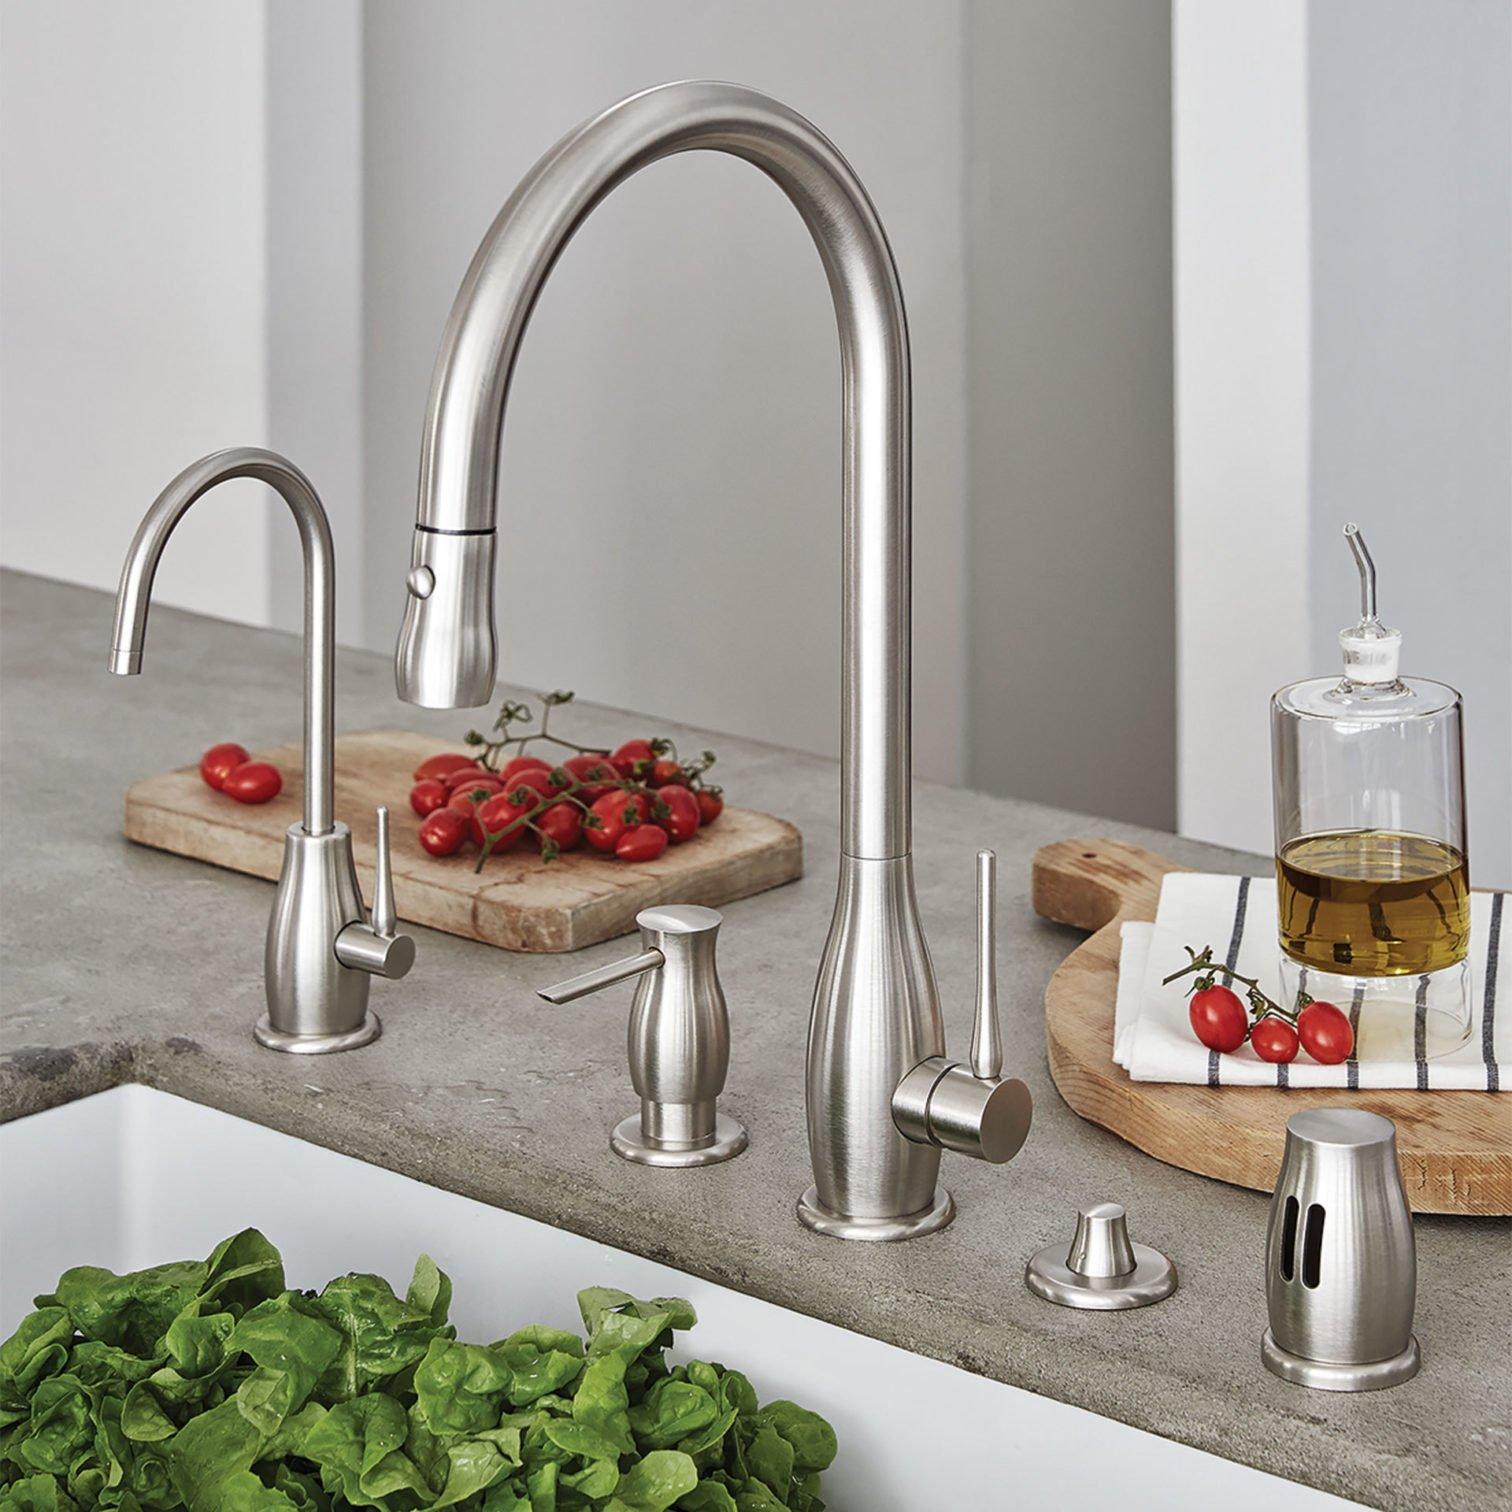 Kitchen series Rosolina ensemble on sink